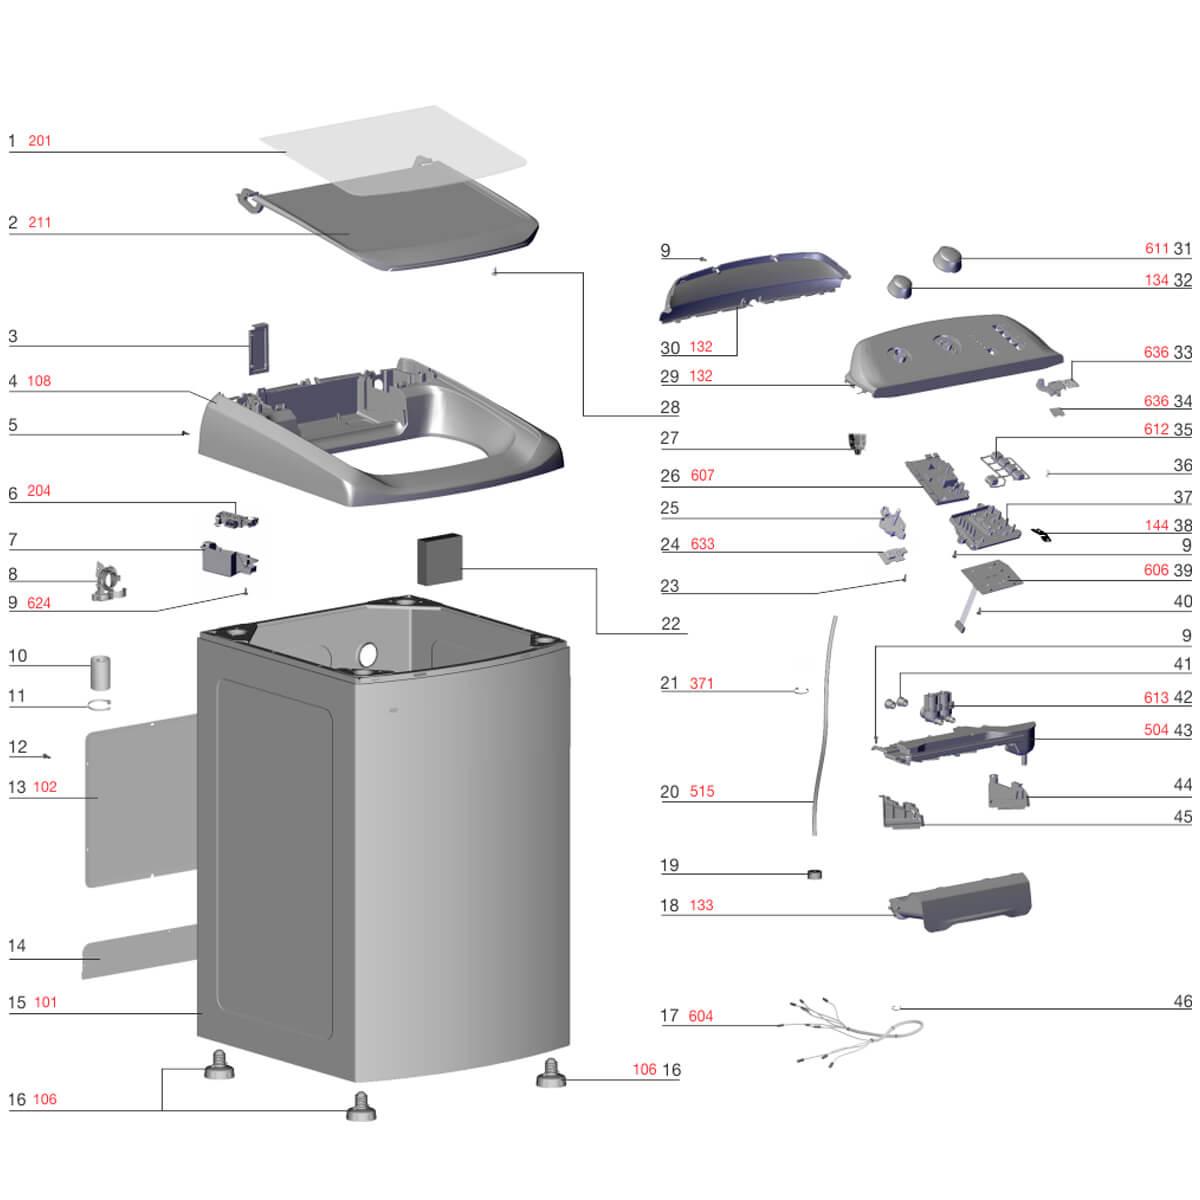 Placa Eletrônica De Programas Lavadora De Roupas Electrolux LWI13 - A13611014